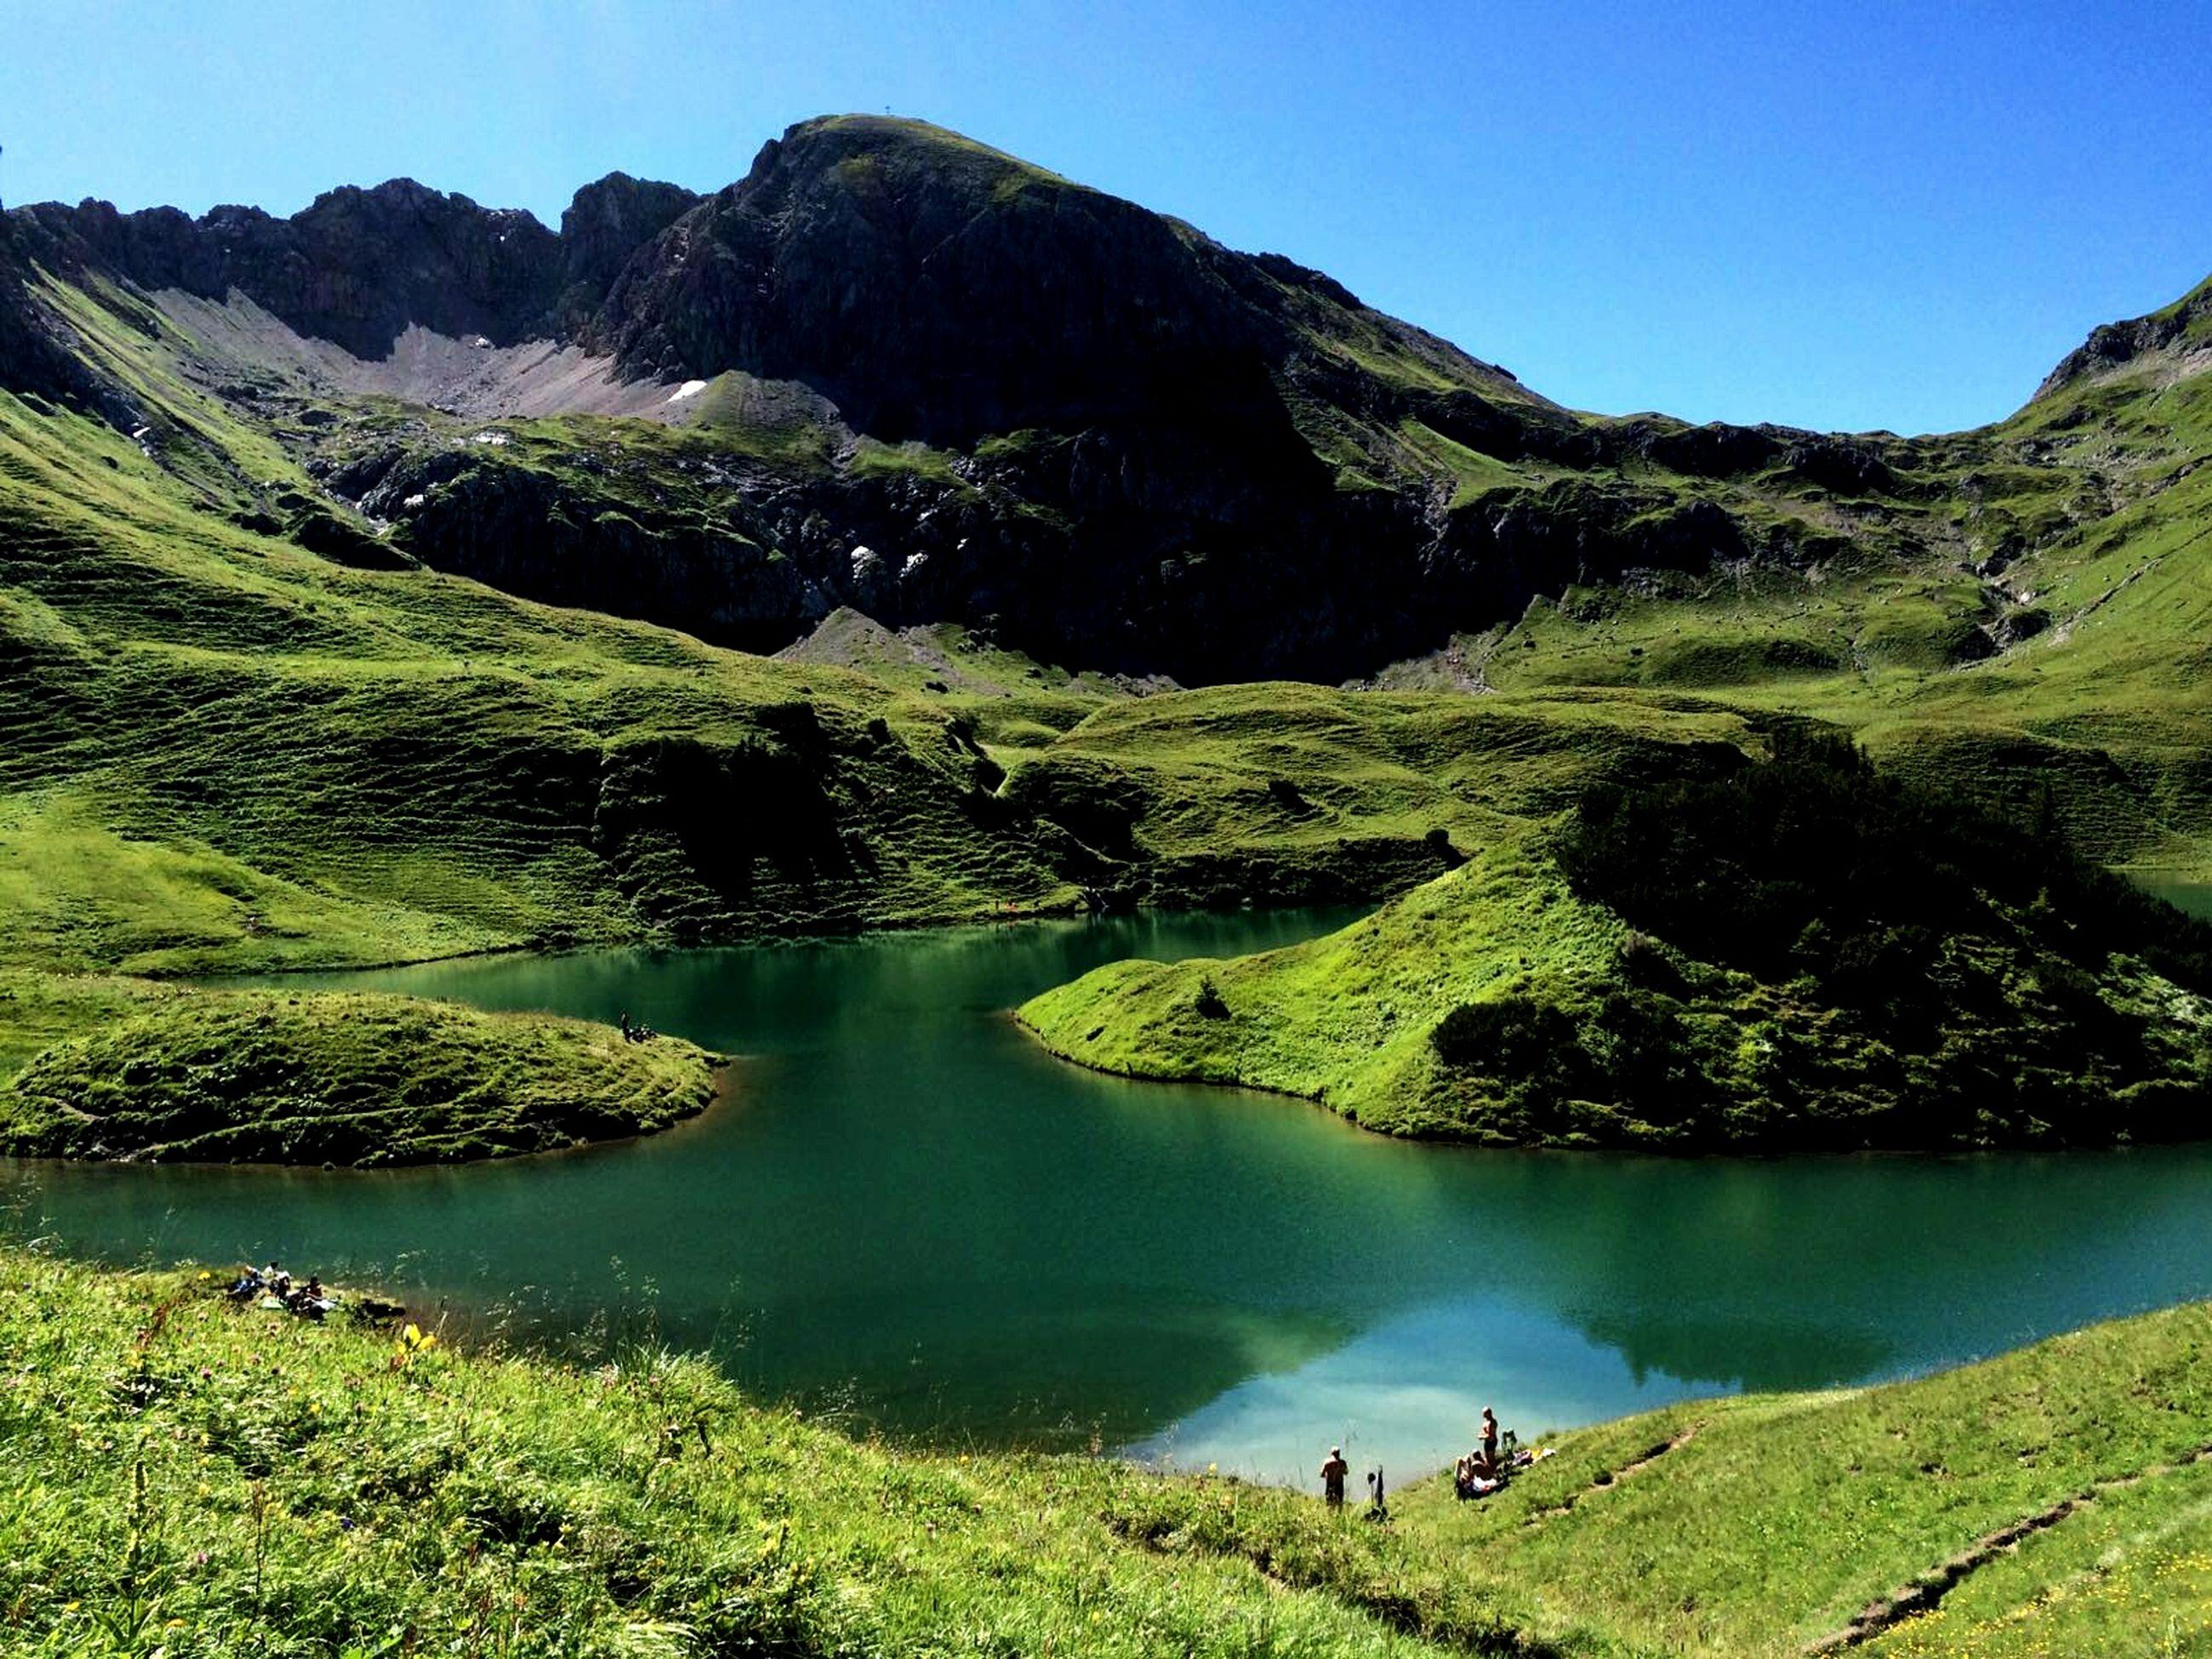 Scenic view of lake against allgau alps